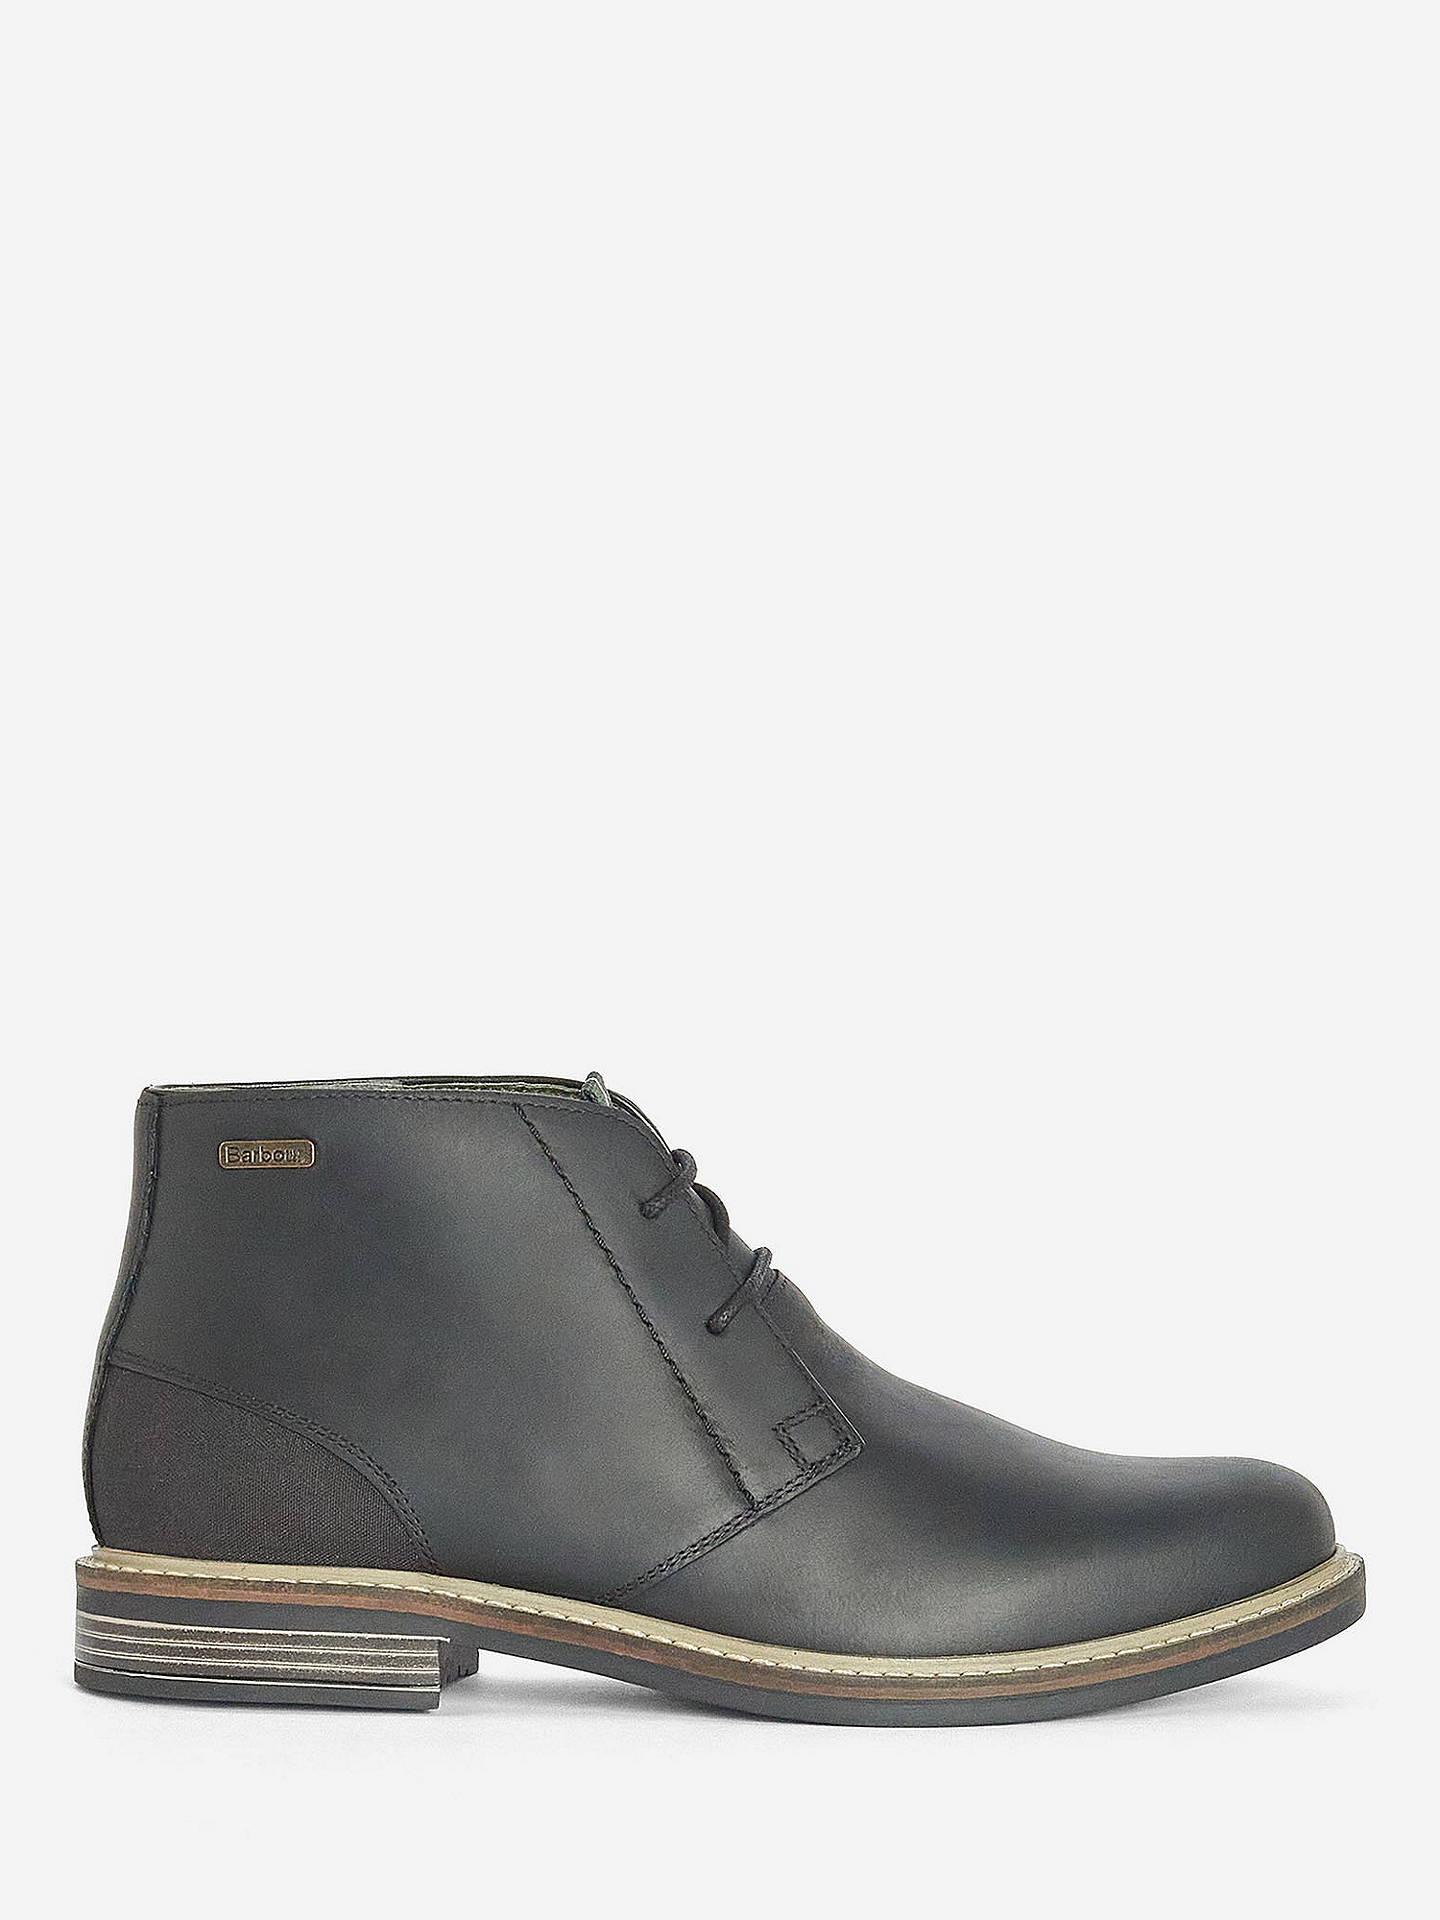 e4ca96bf797 Barbour Redhead Lightweight Chukka Boots, Black